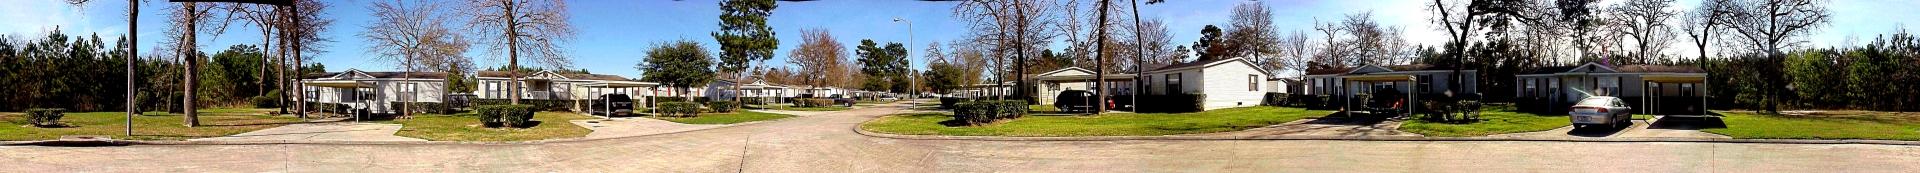 Panorama of Mesa Oaks Drive, Magnolia